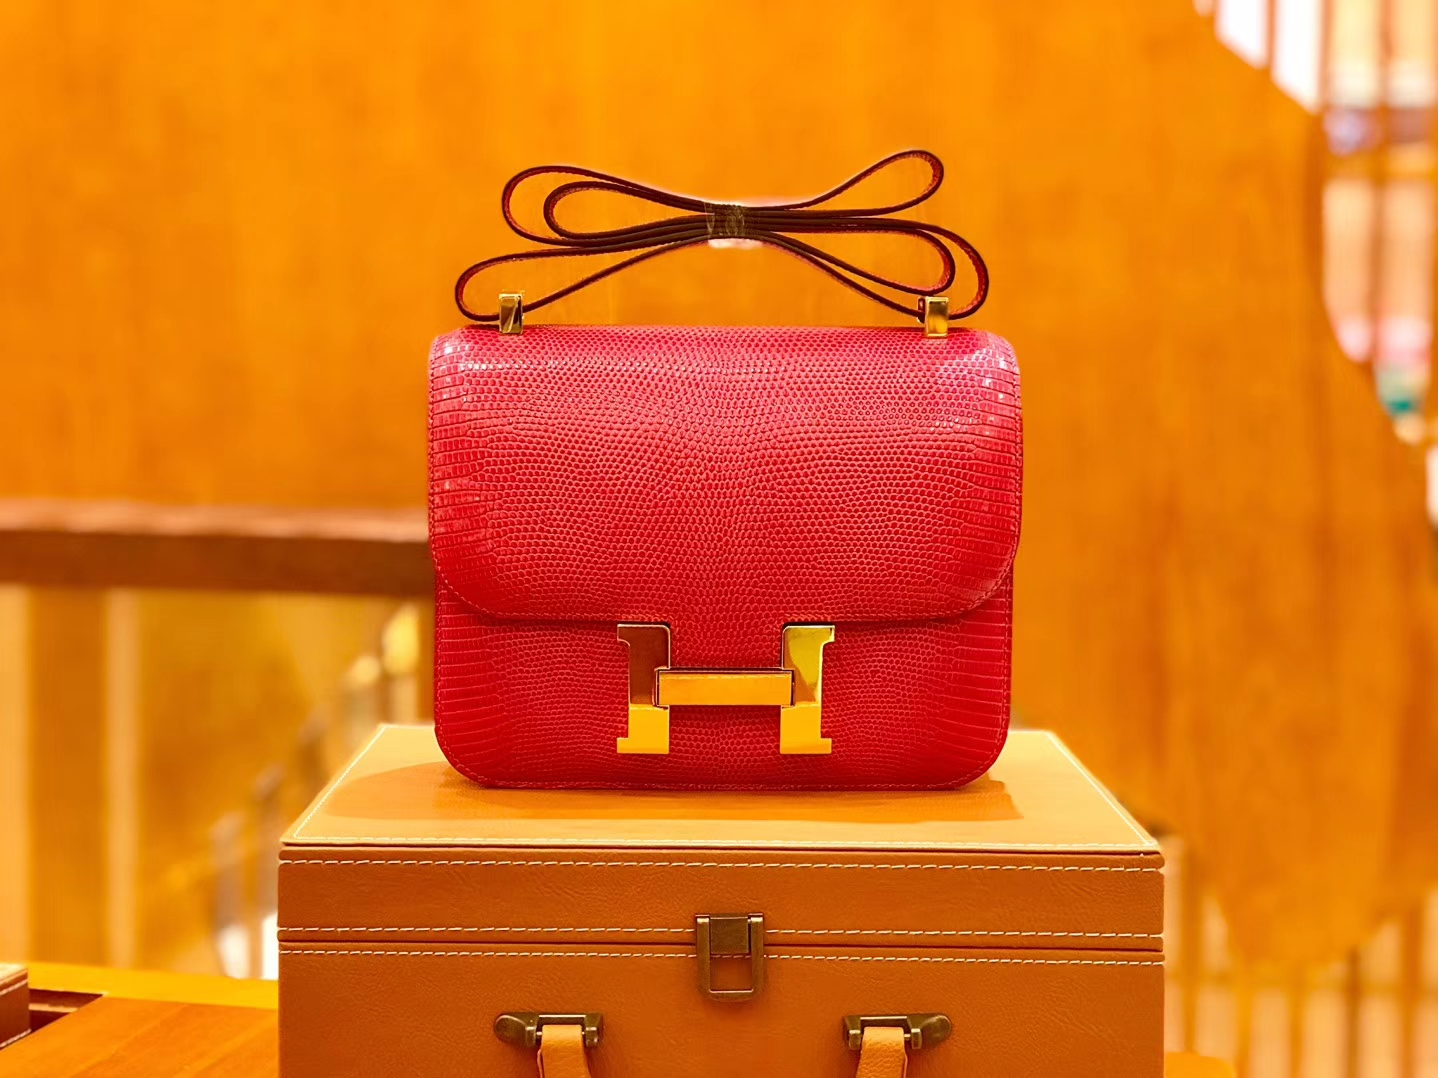 Hermès(爱马仕)Constance 空姐包 蜥蜴皮 桃红色 24cm